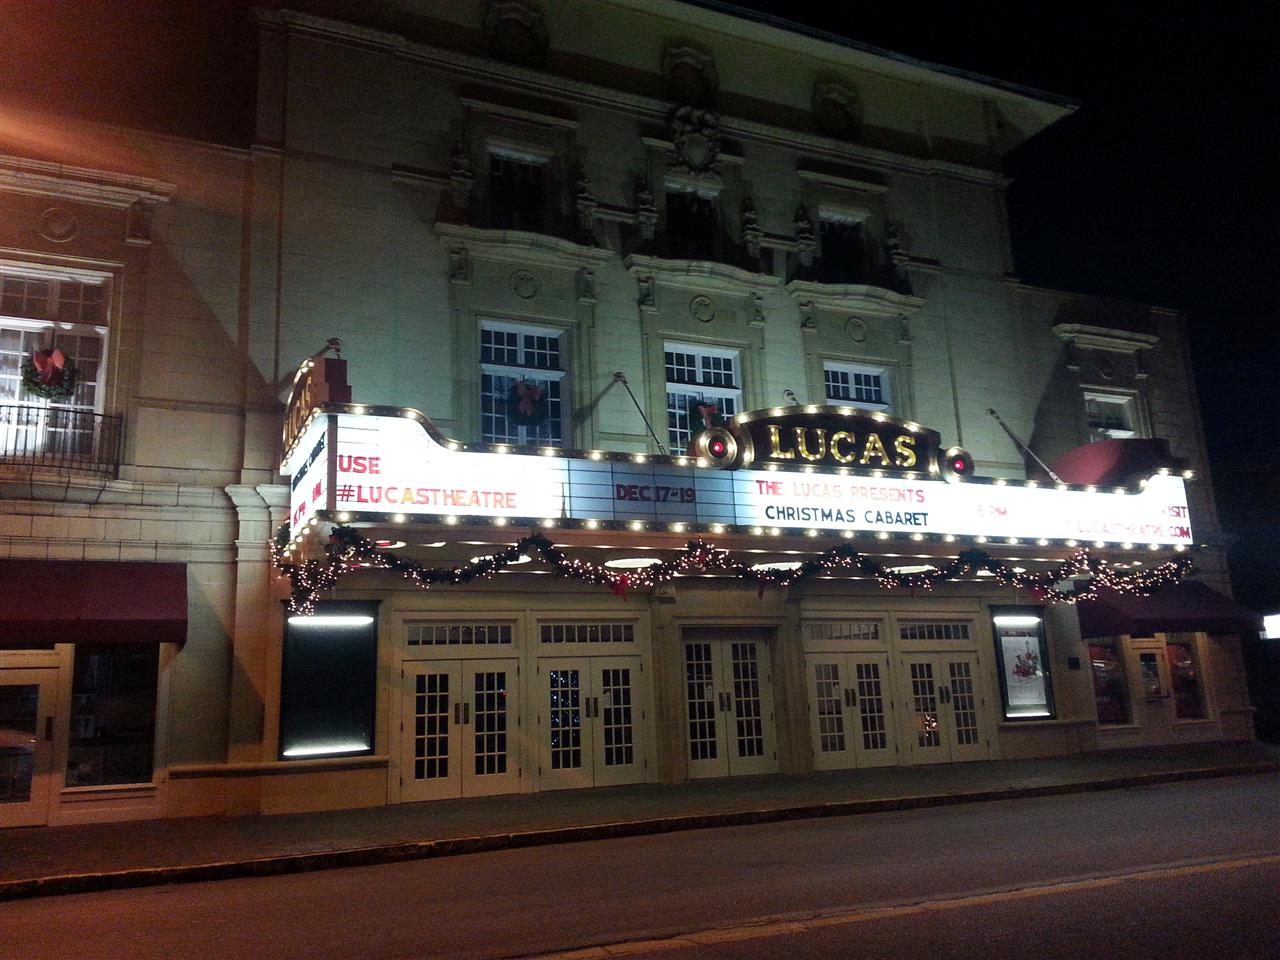 Savannah, Ga. The Lucas Theater